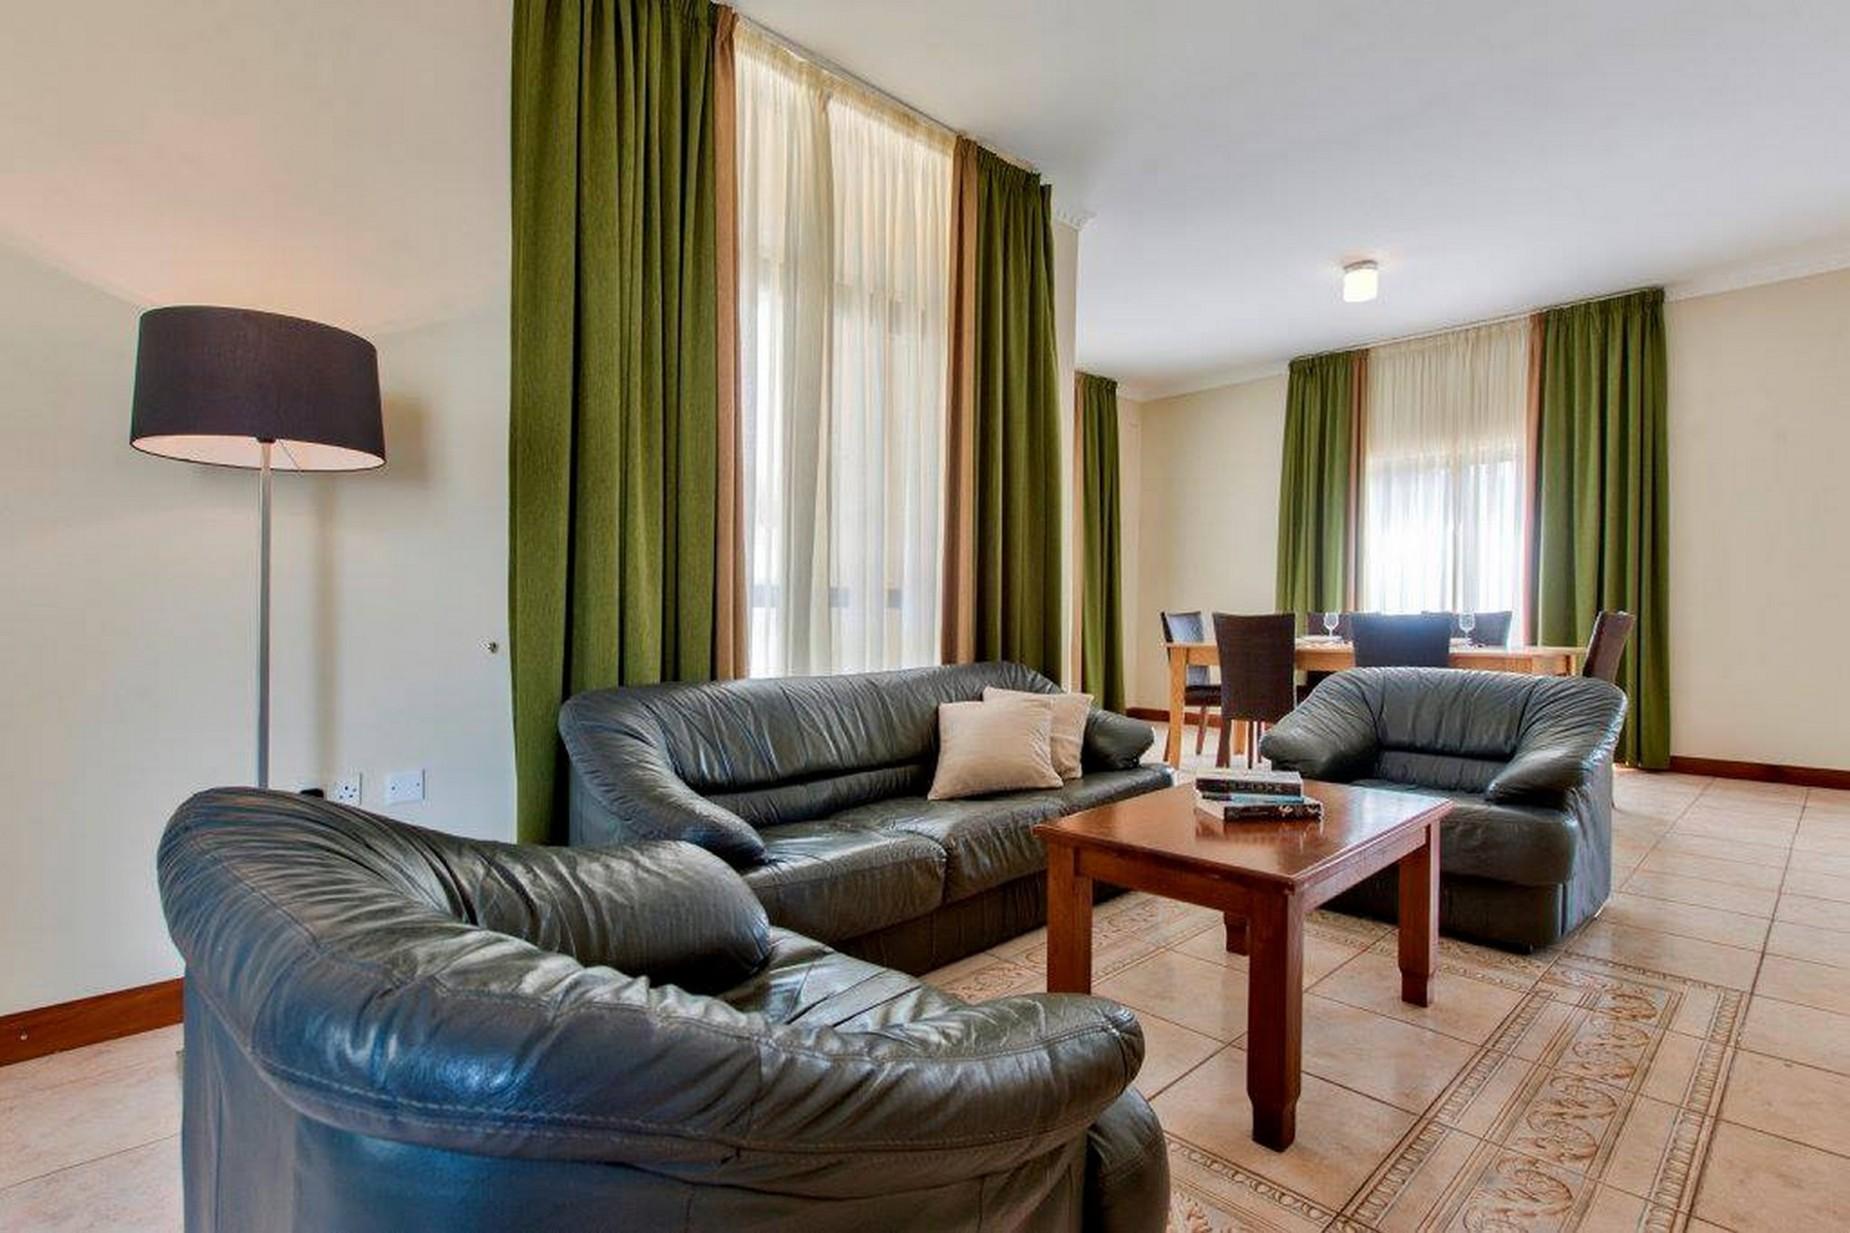 3 bed Villa For Rent in Mellieha, Mellieha - thumb 3